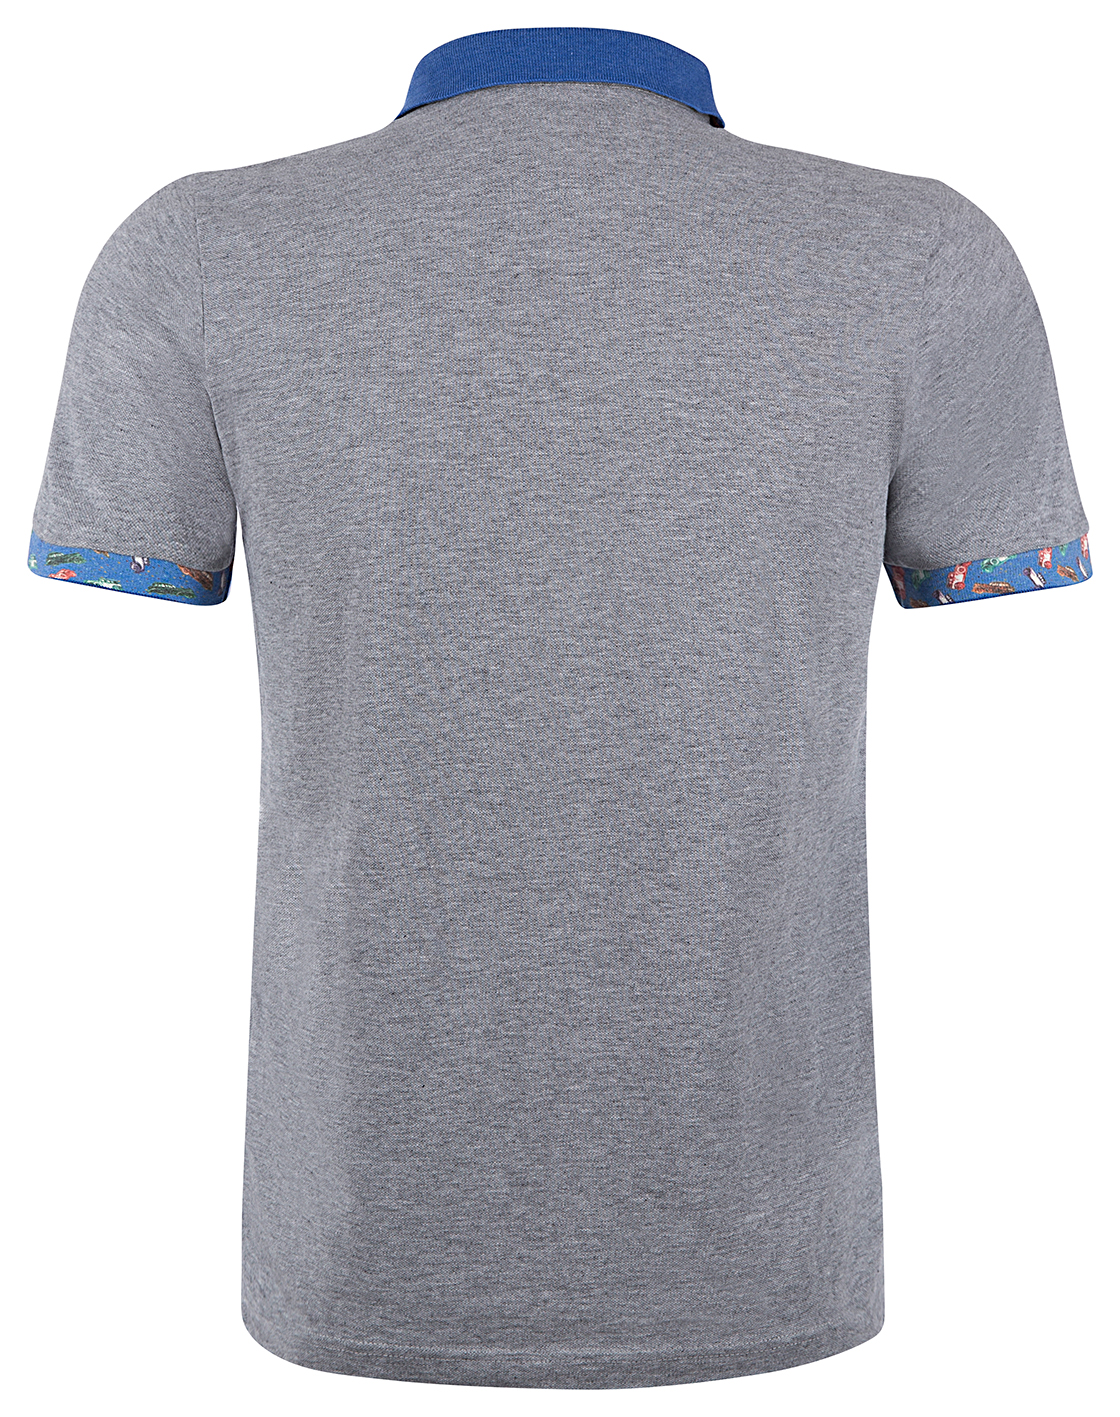 "BOB Herren Poloshirt ""Reef"" Grigio Melange 2"